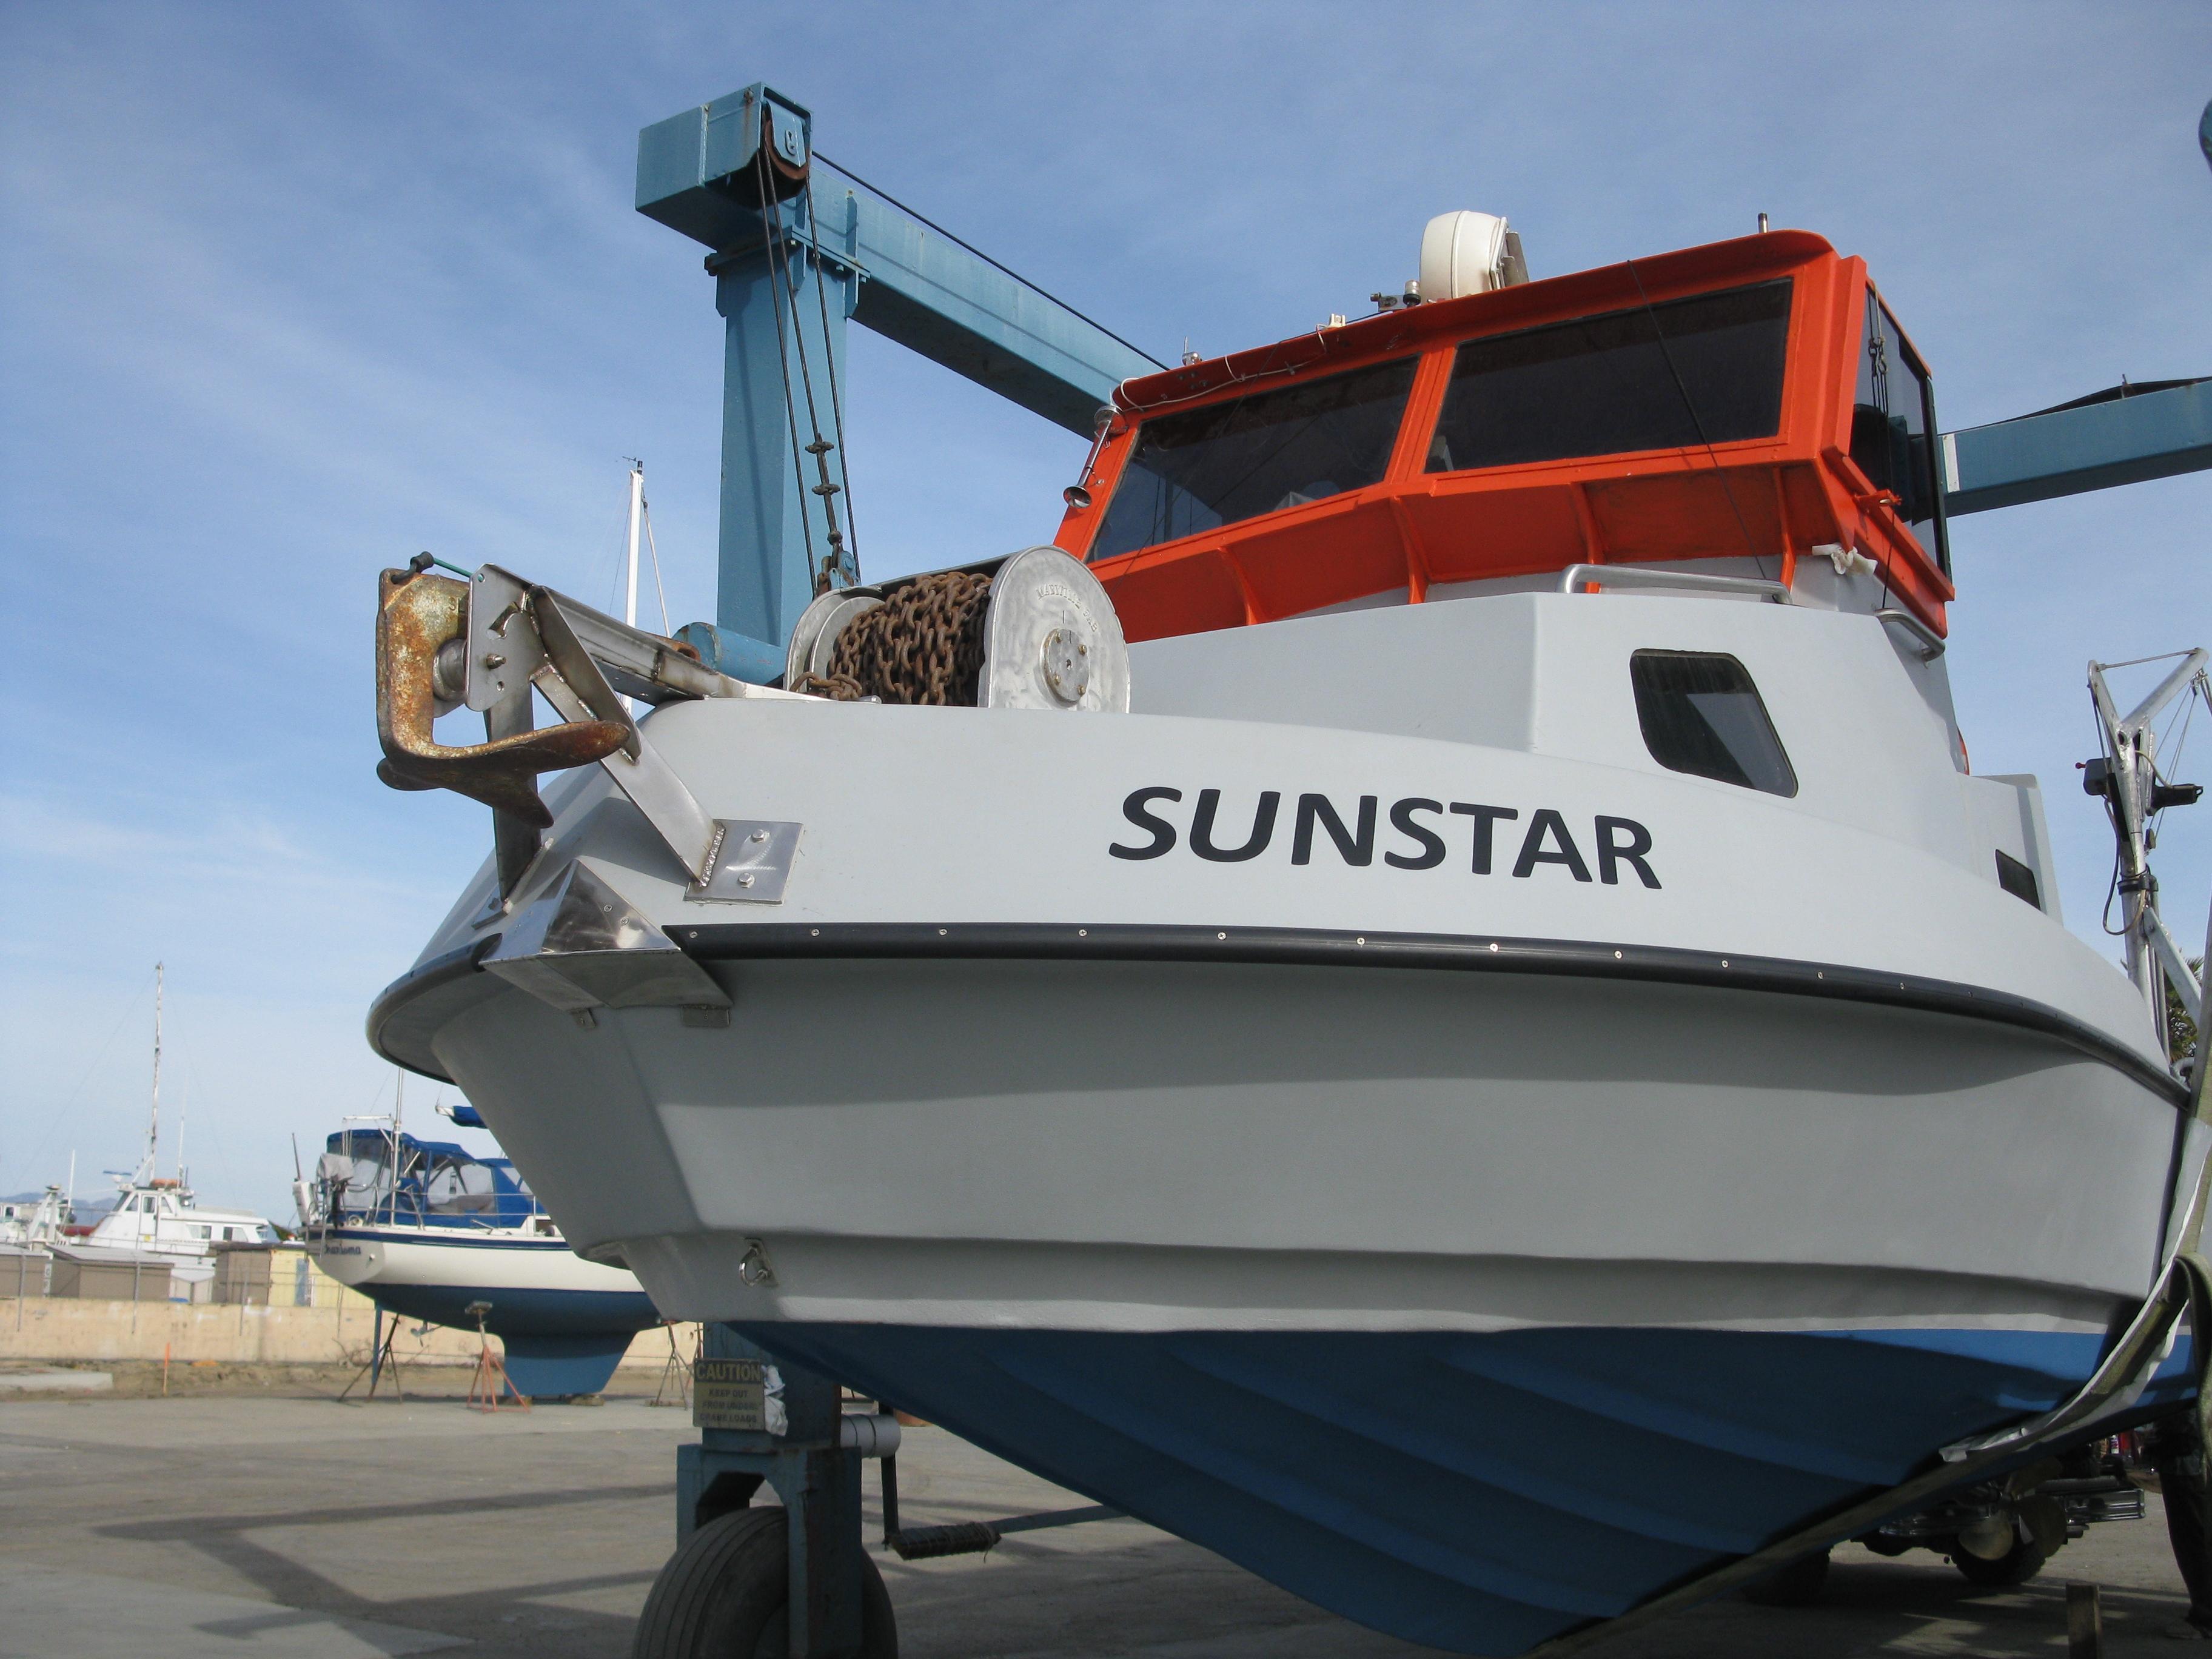 Seaboard Marine Sunstar Repower Project